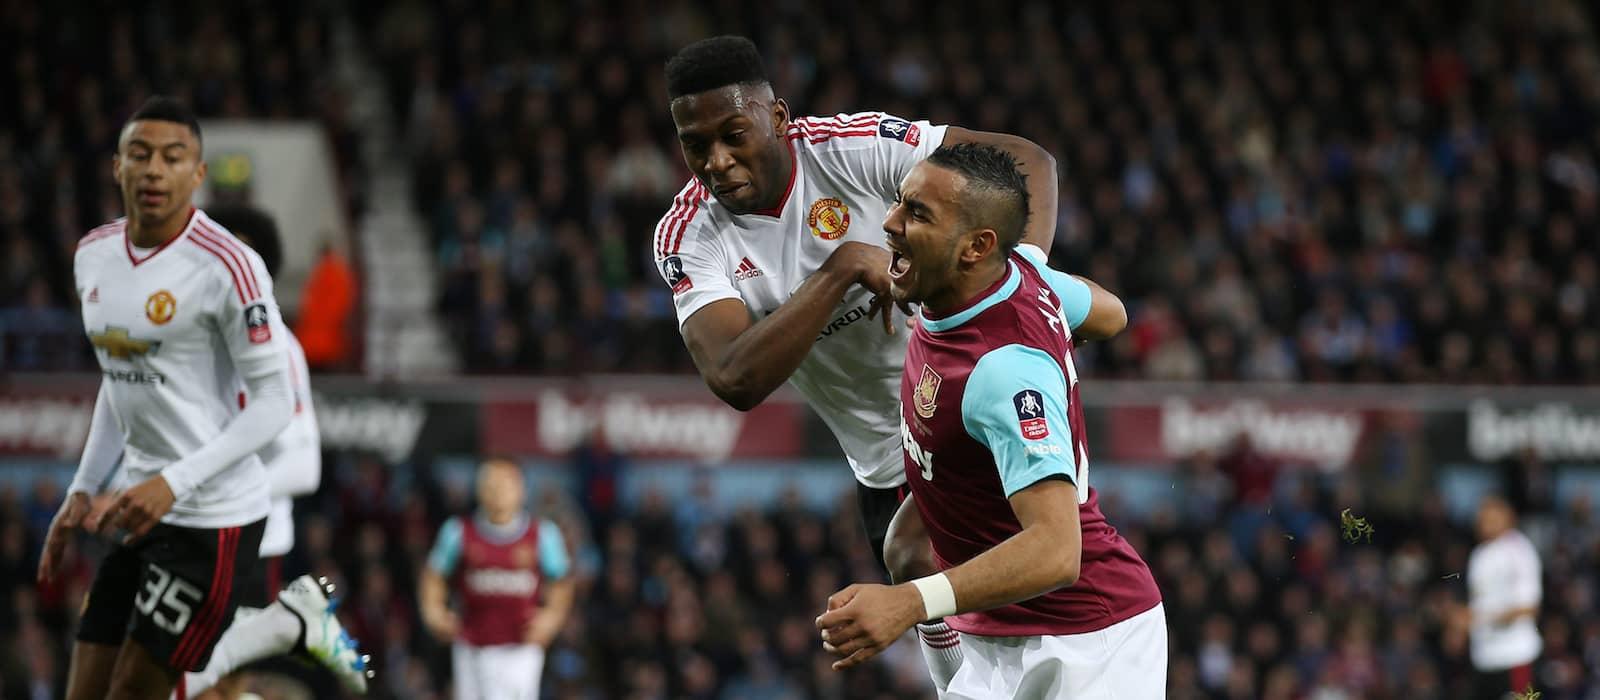 Timothy Fosu-Mensah prioritising Manchester United over Netherlands duty